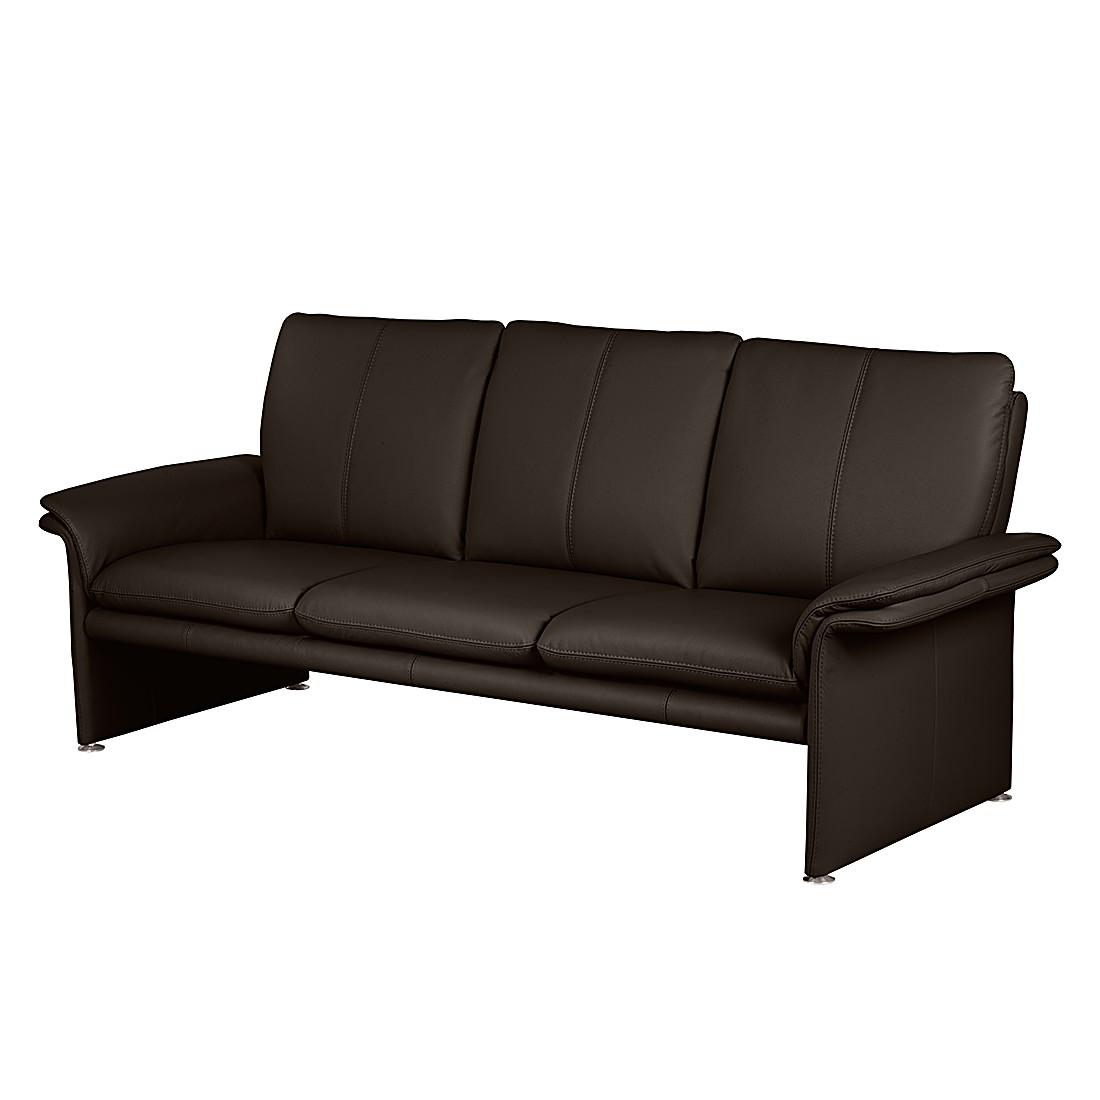 Sofa Capri (3-Sitzer) – Echtleder Dunkelbraun, Nuovoform günstig